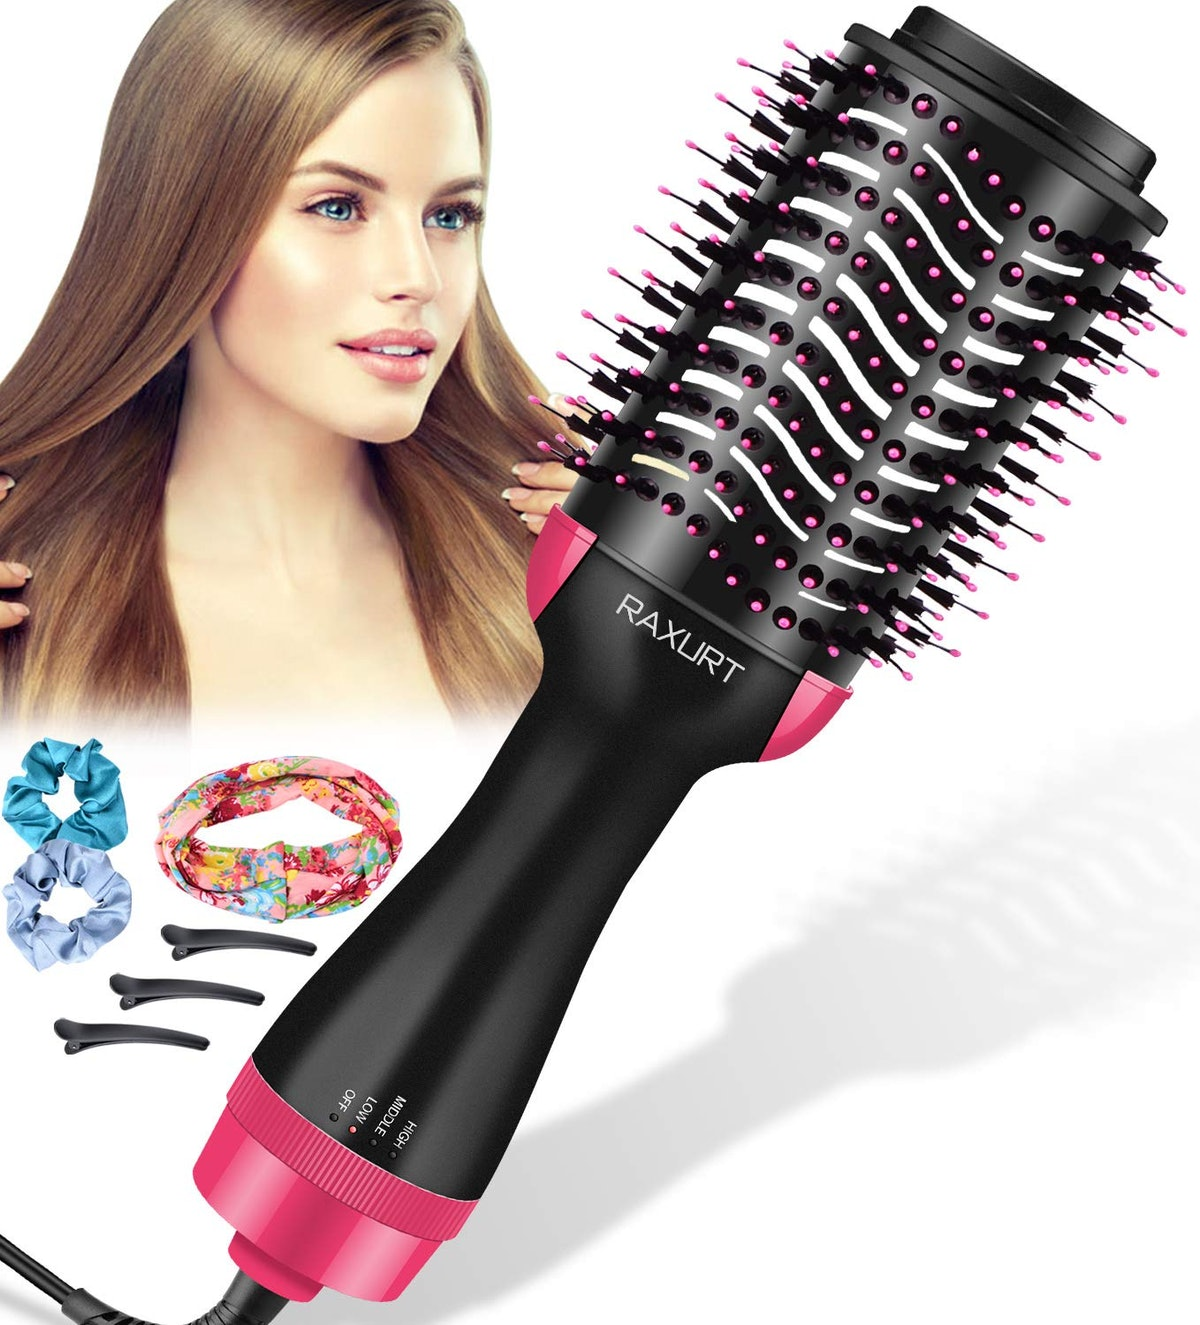 RAXURT Hair Dryer Brush